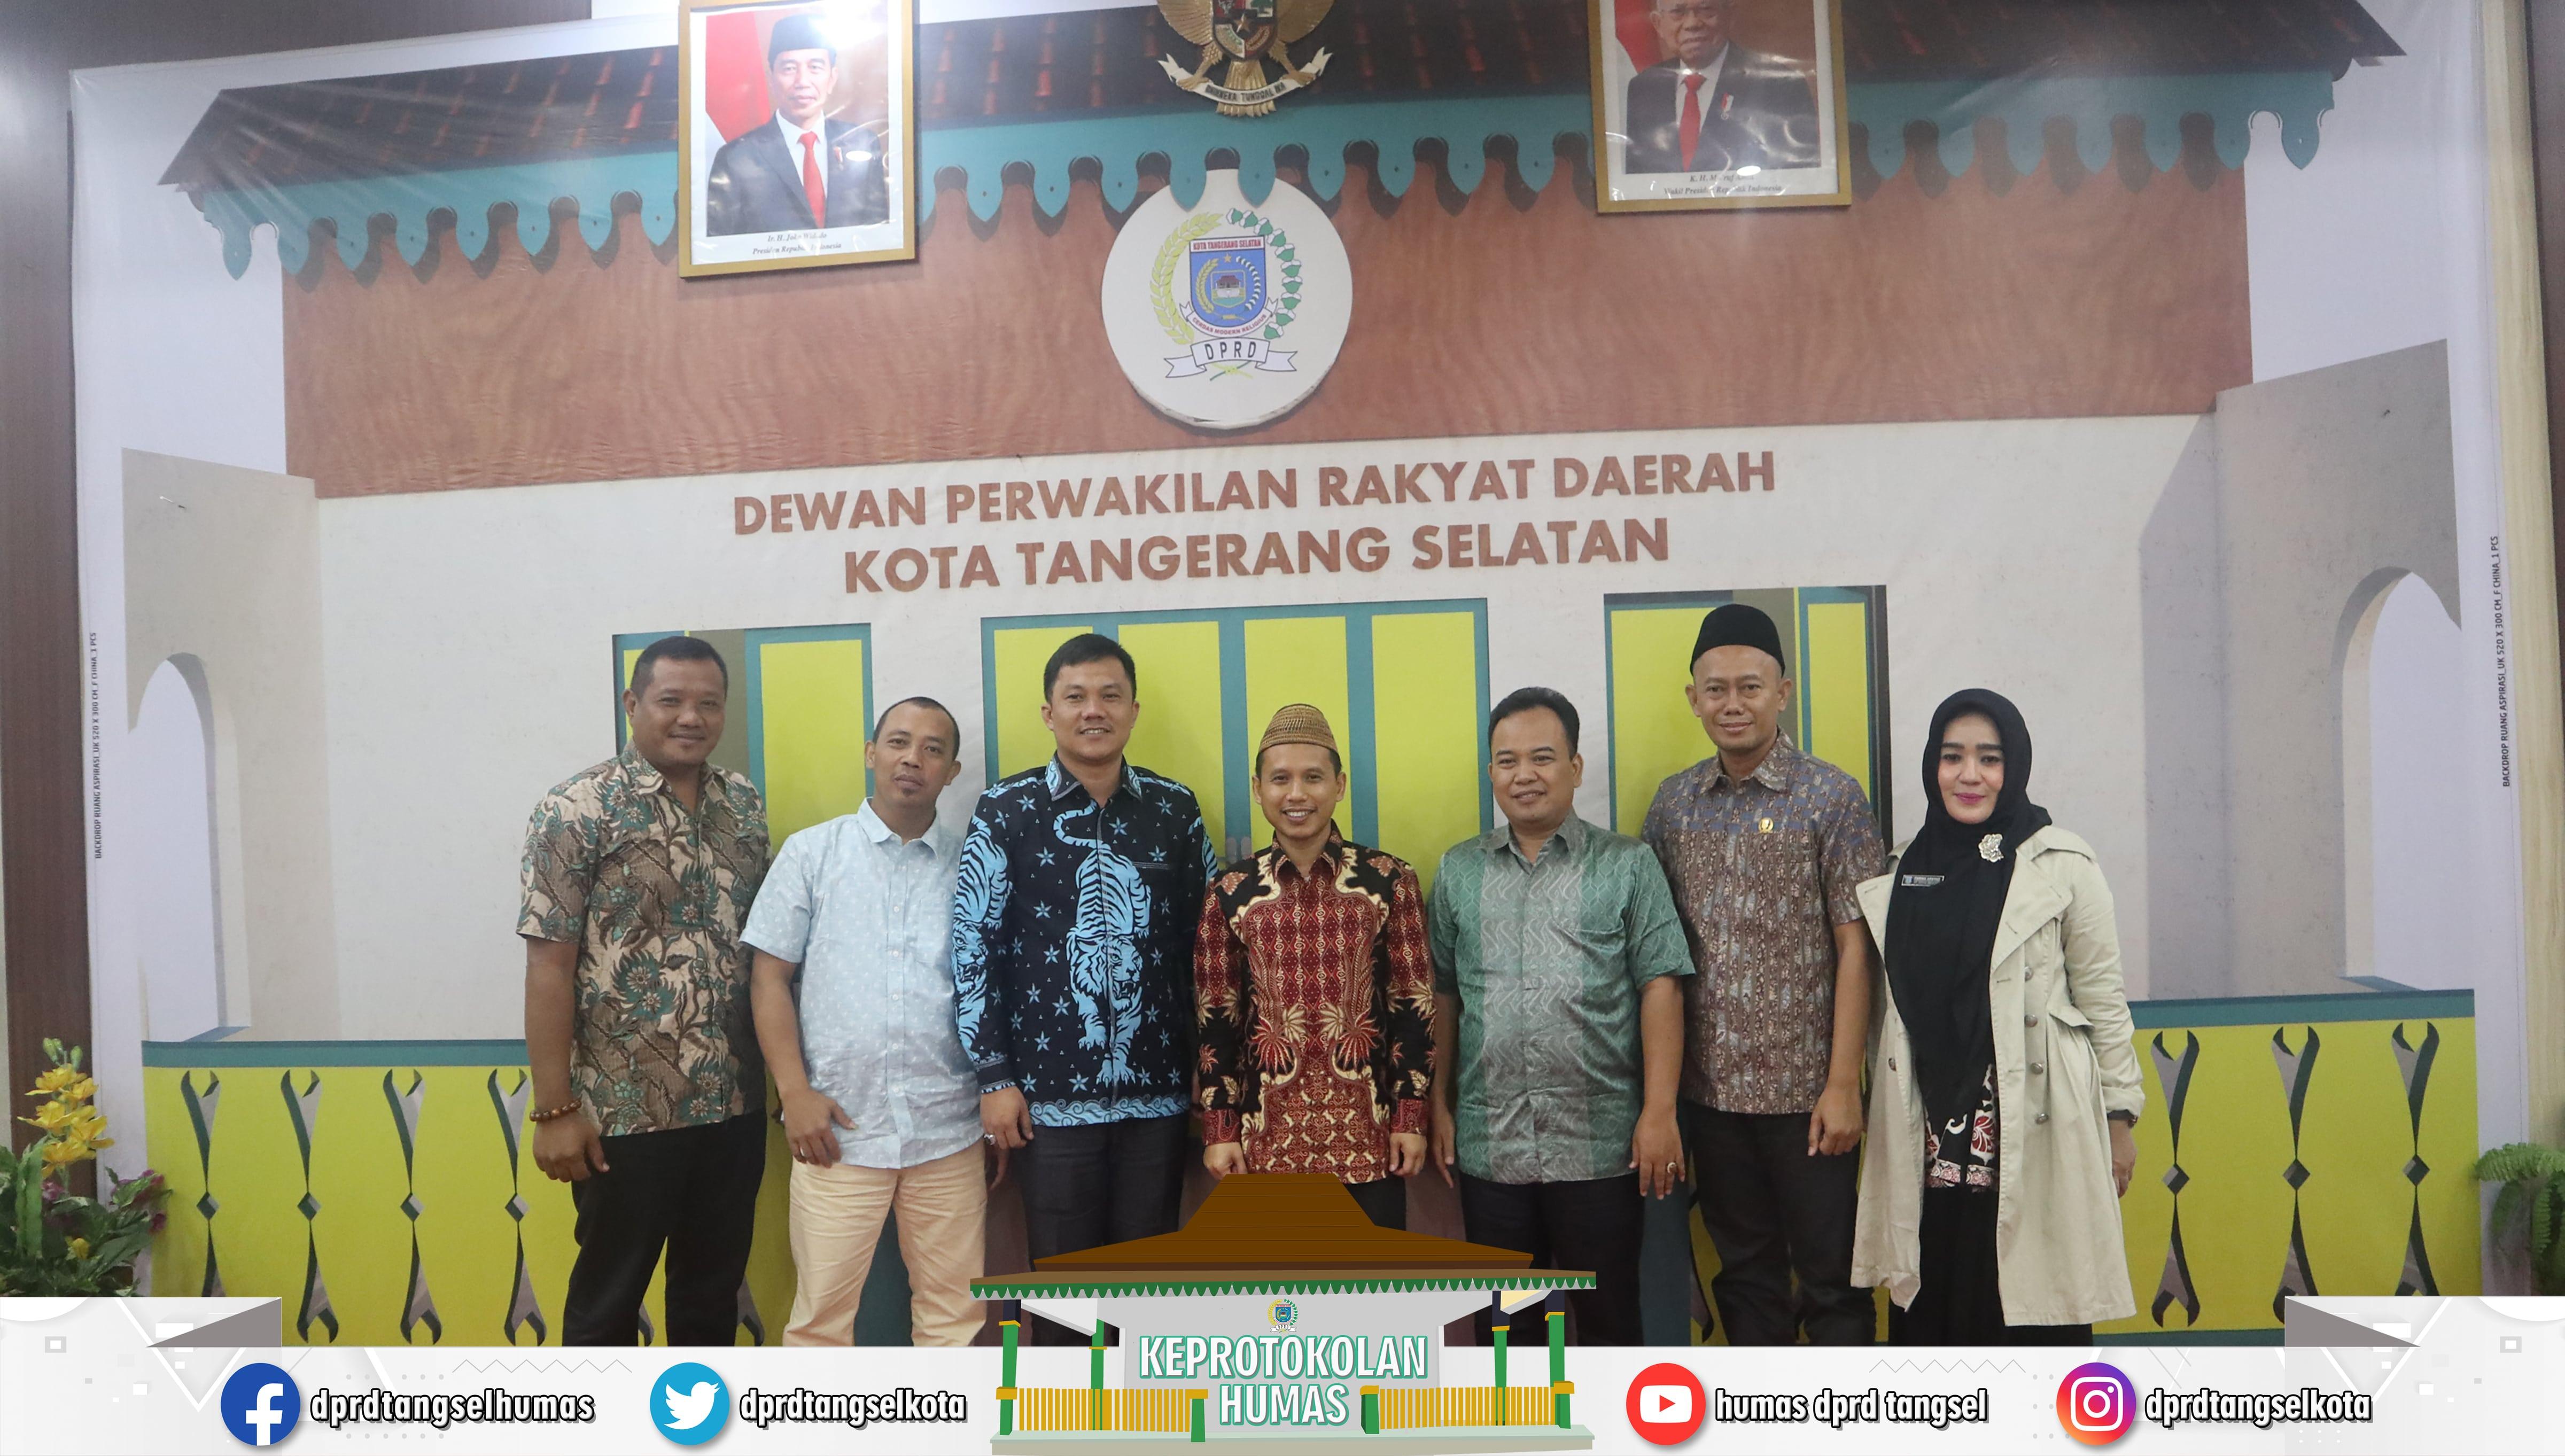 Mustopa Wakil Ketua DPRD Menerima kunjungan kerja 2 DPRD Kabupaten